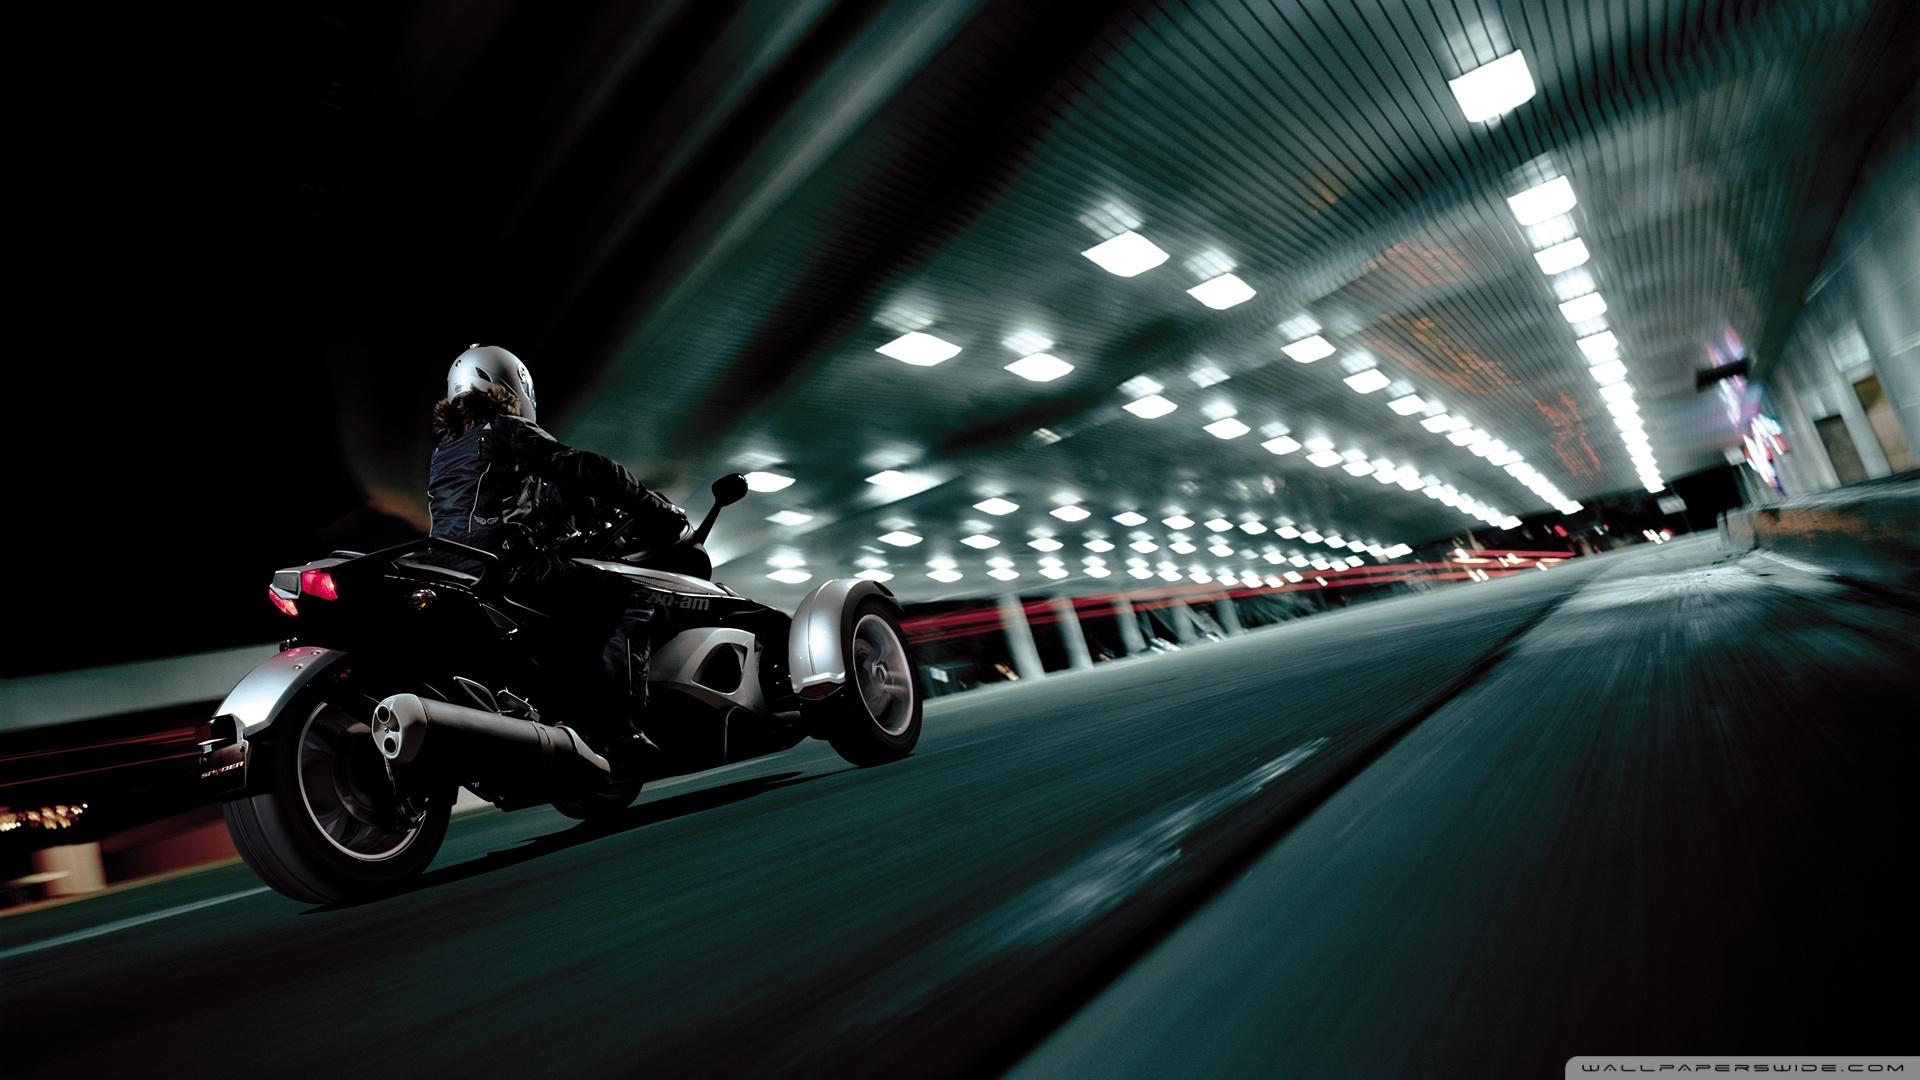 hd wallpaper custom motorcycle hd wallpaper 2560x1600 633 kb 1920x1080